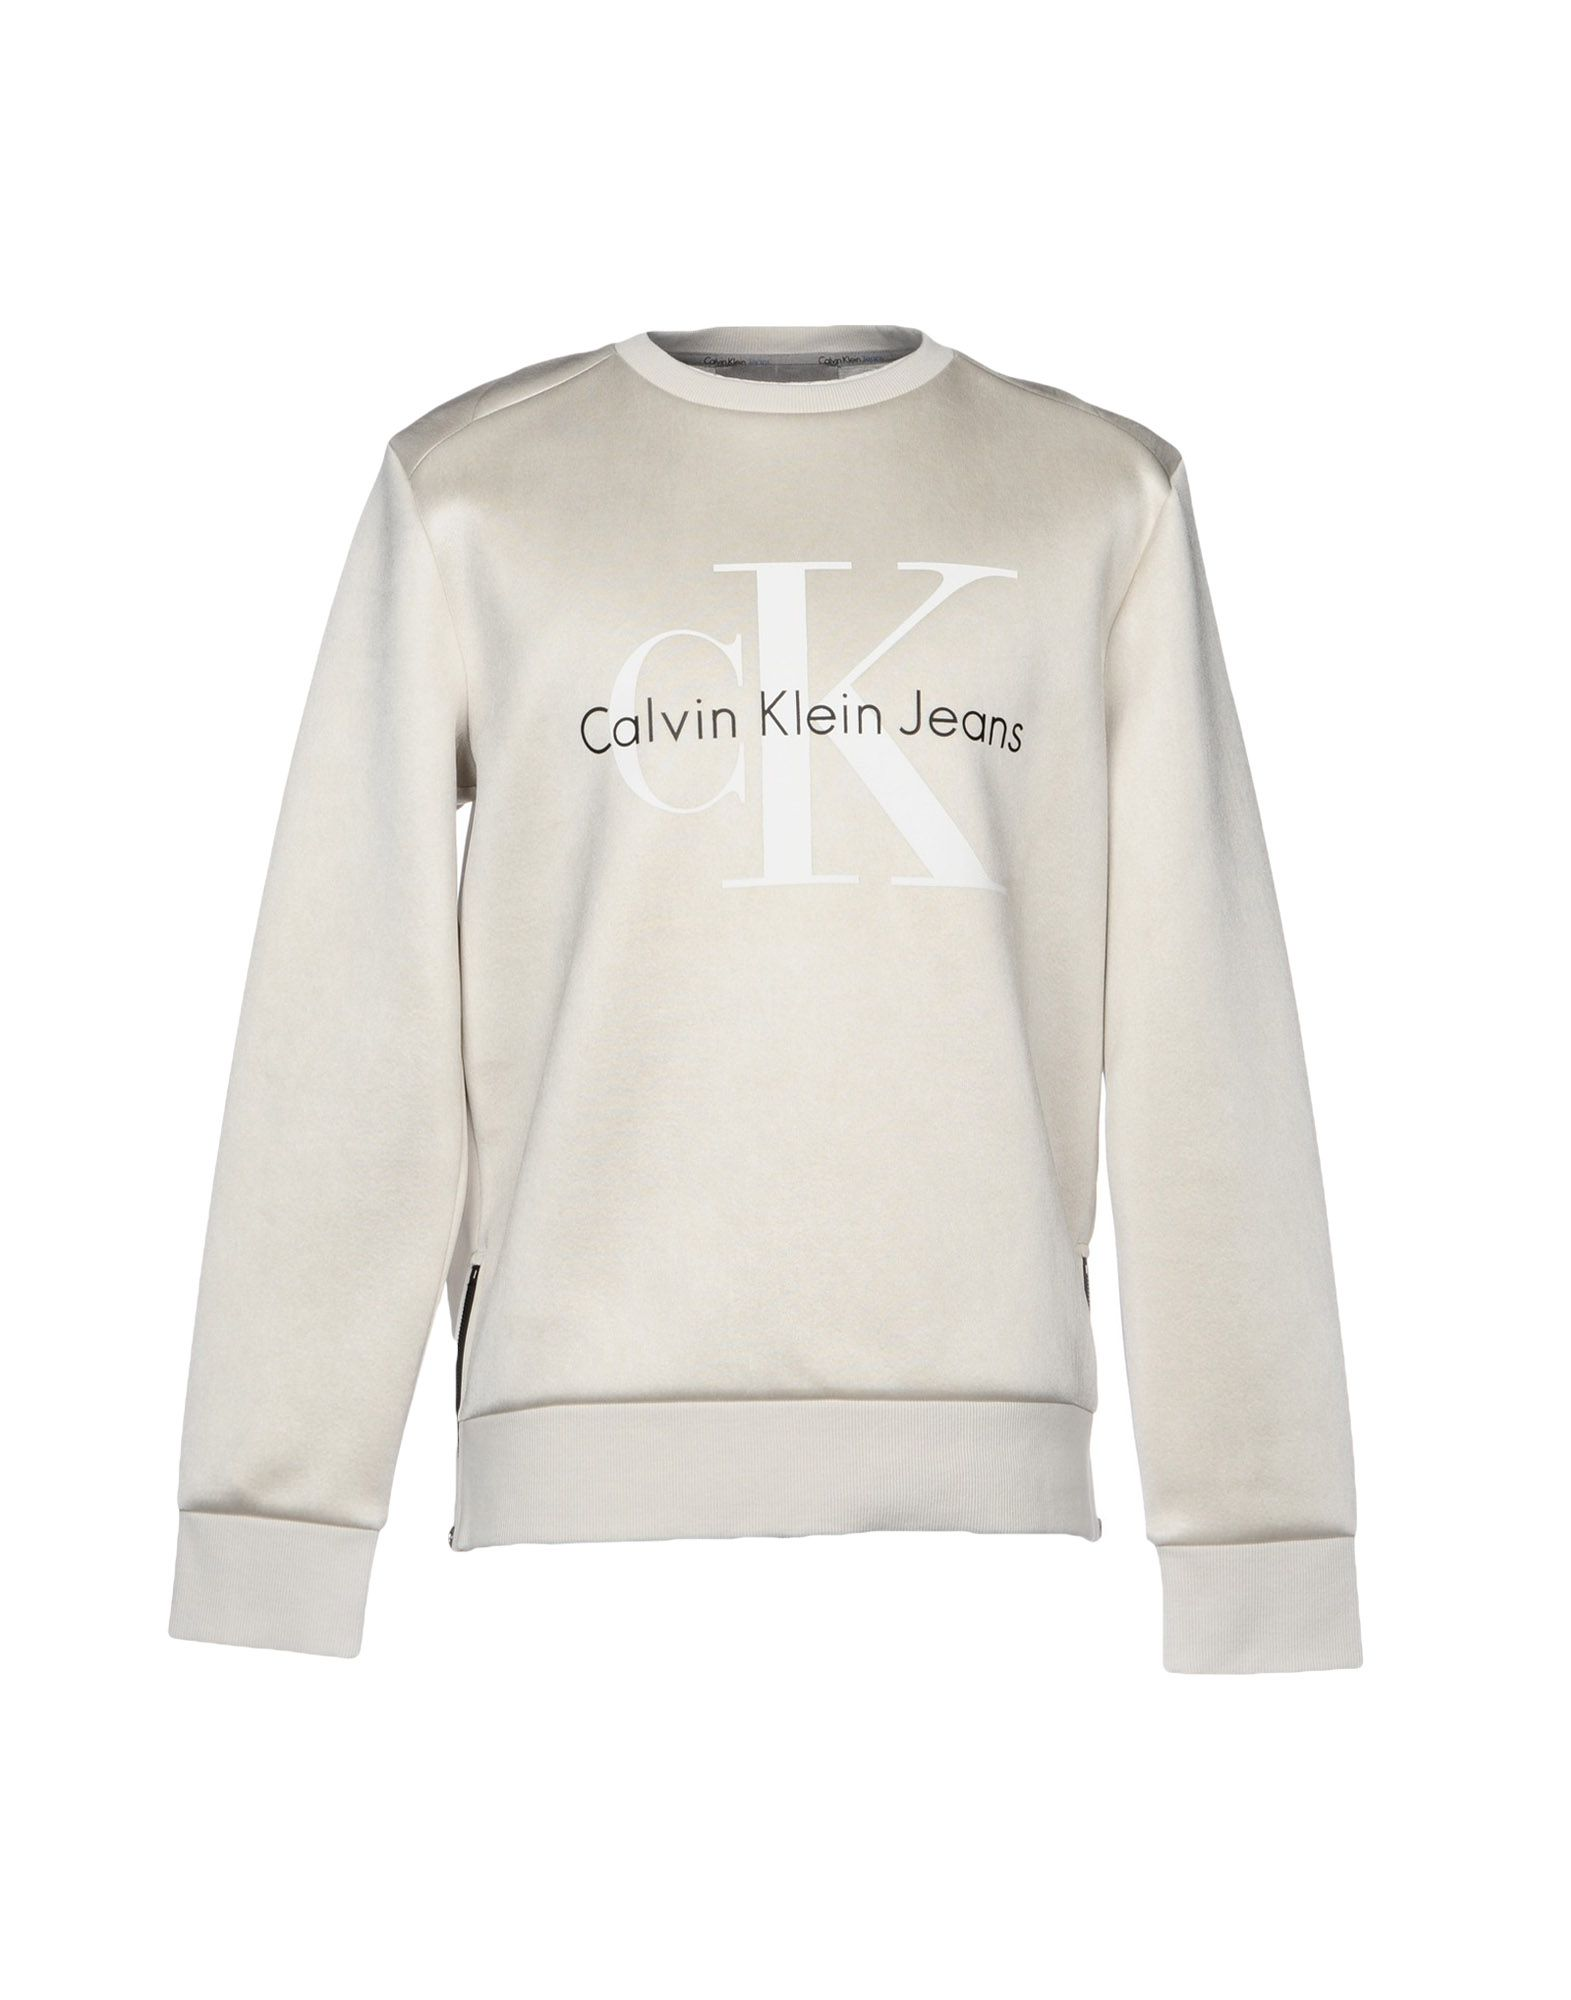 CALVIN KLEIN JEANS Толстовка толстовка детская calvin klein jeans kck3f1ktkb8100xa 130